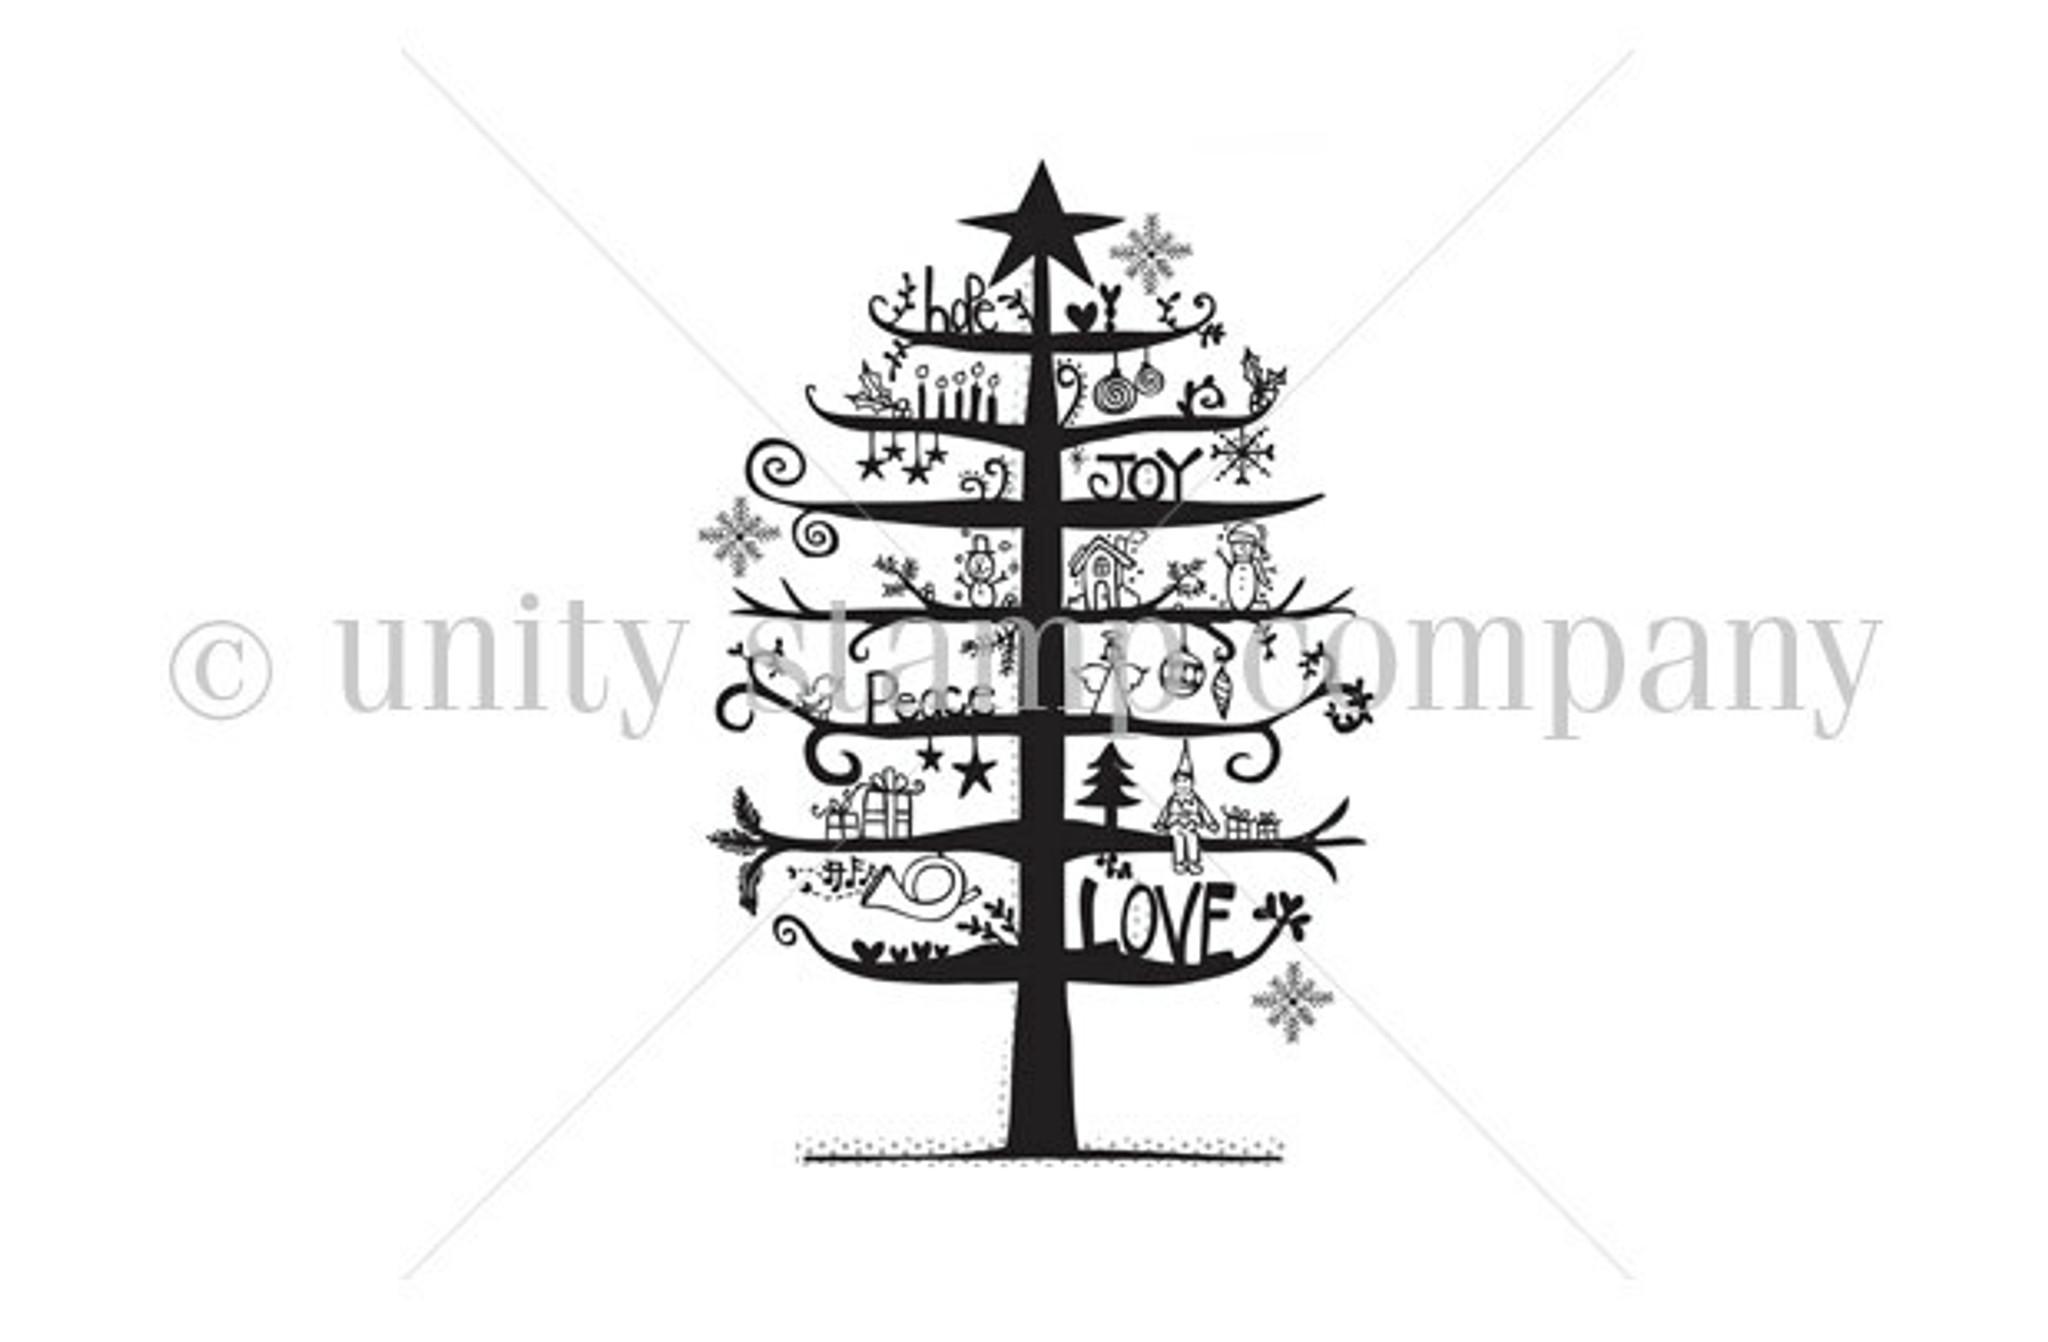 Christmas Tree Of Hope, Joy, Love